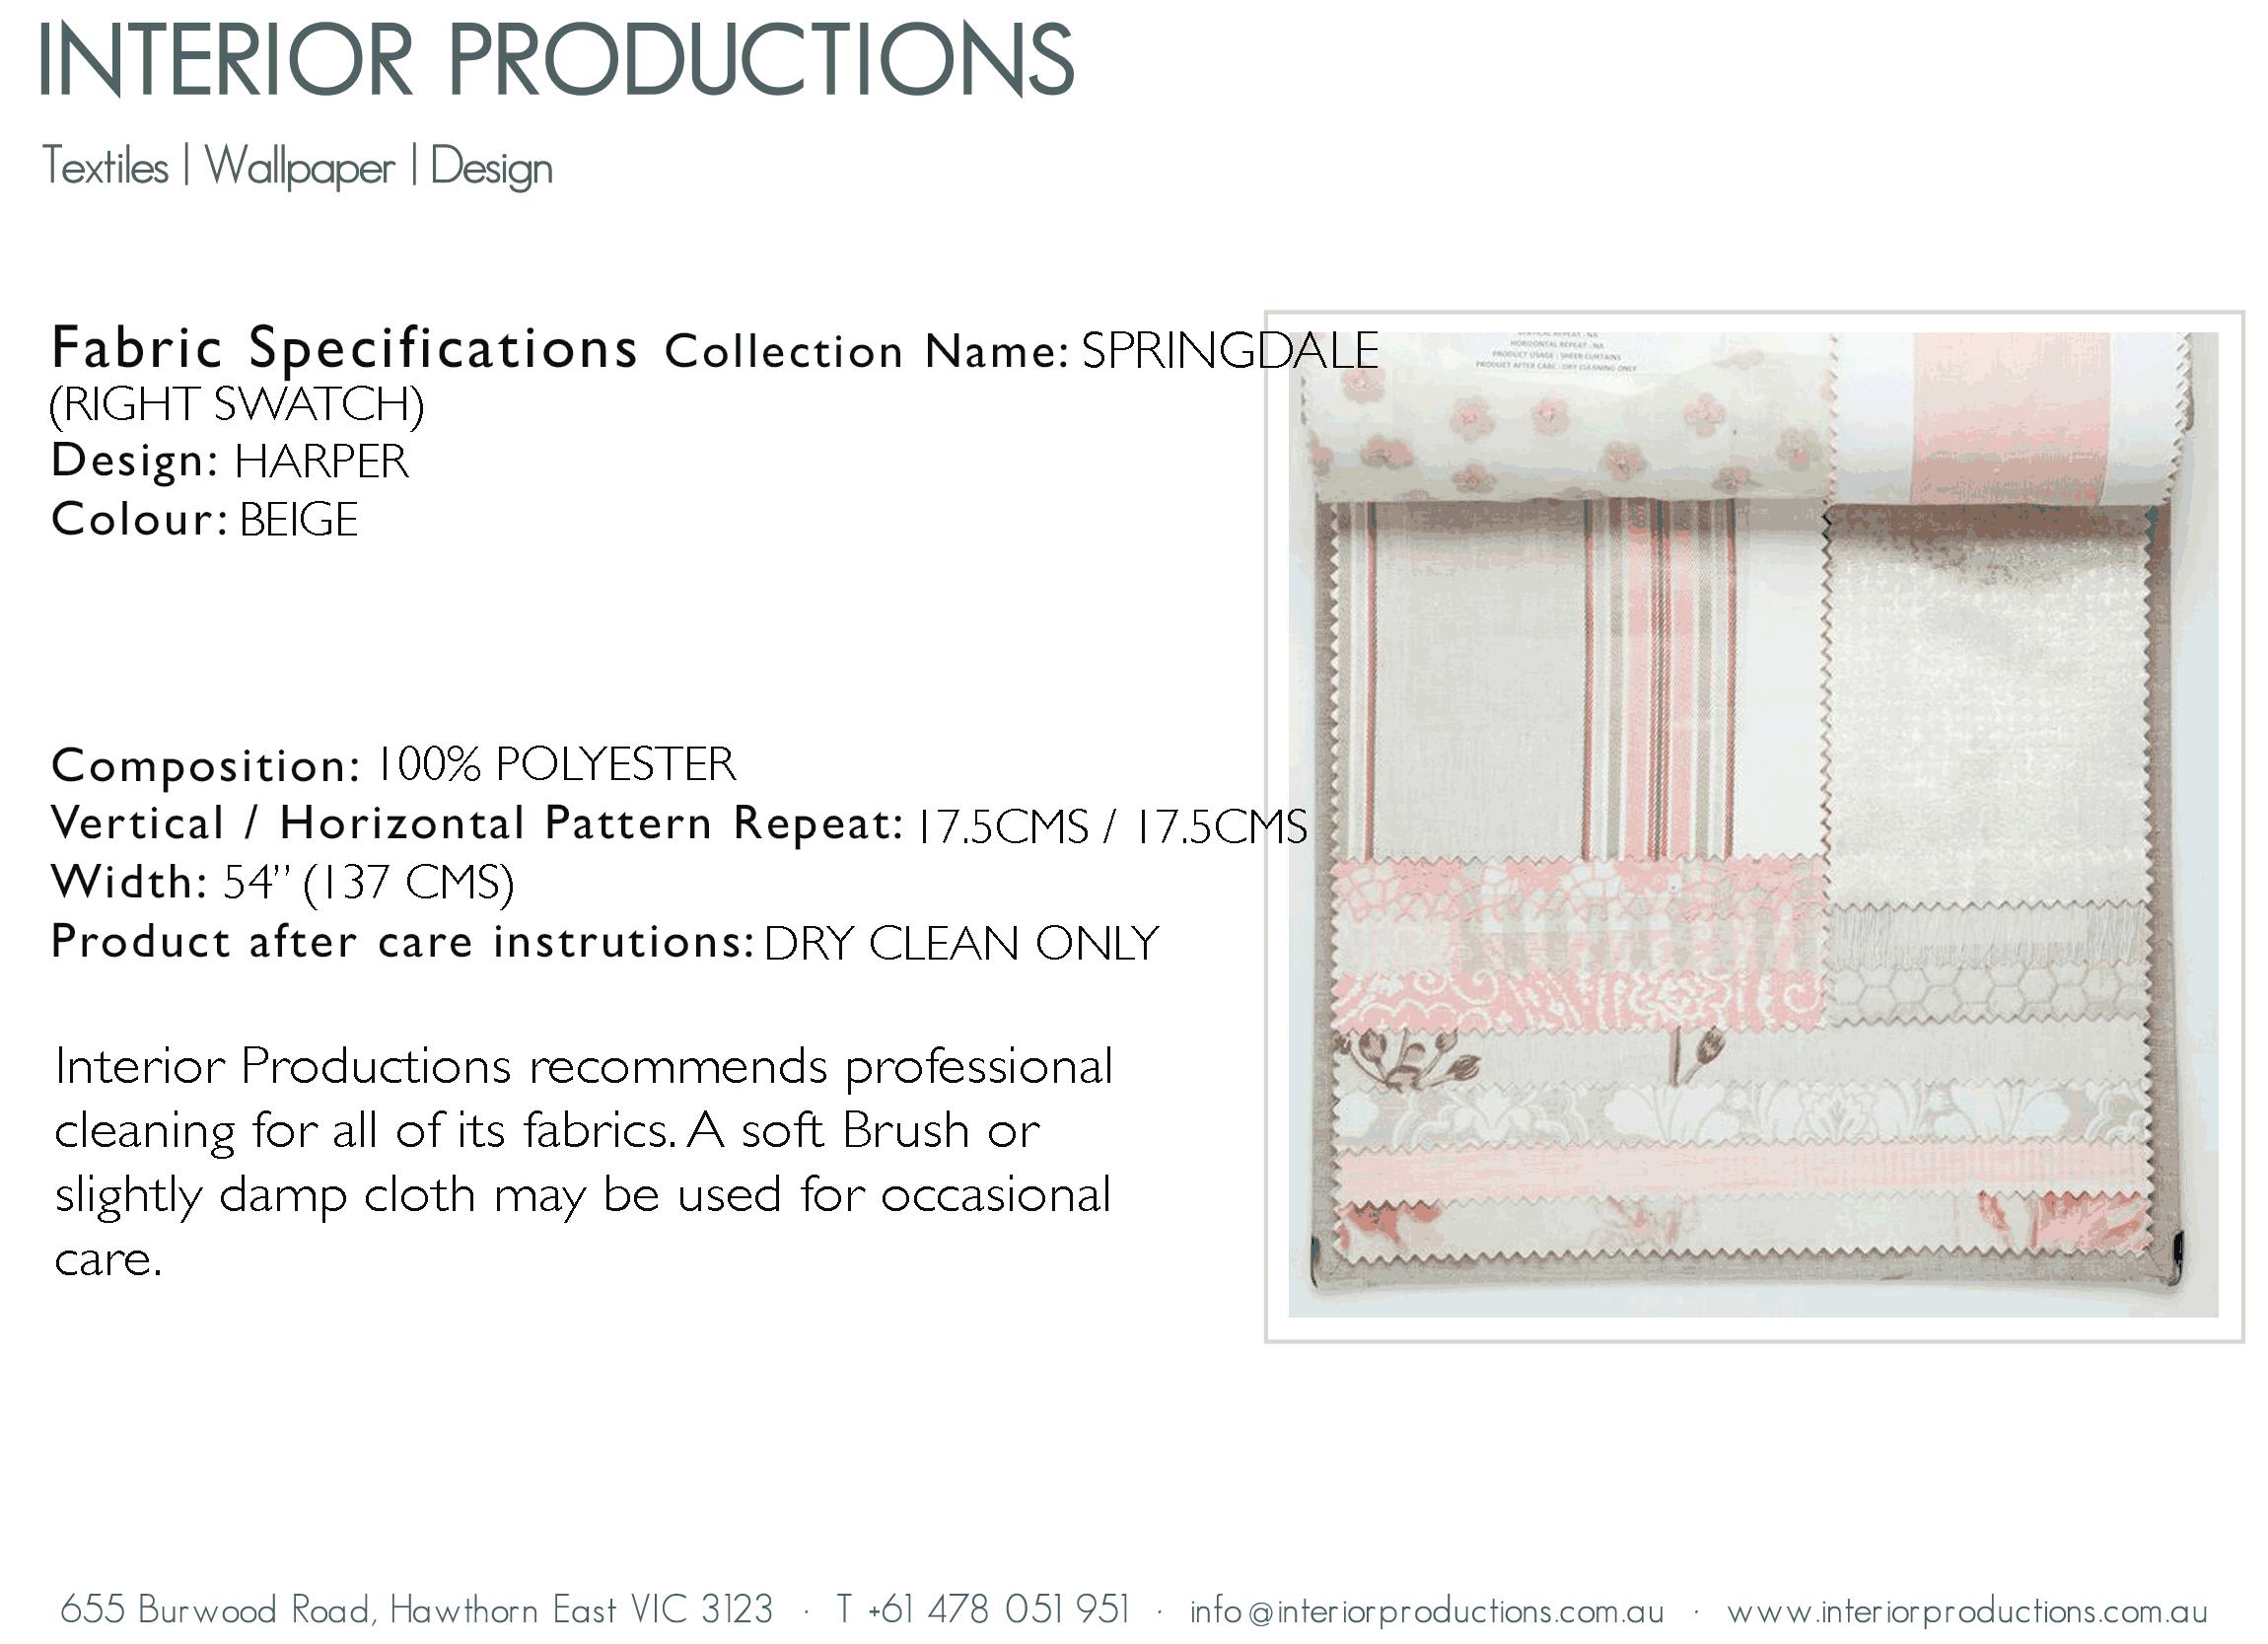 interior_productions_HARPER---BEIGE